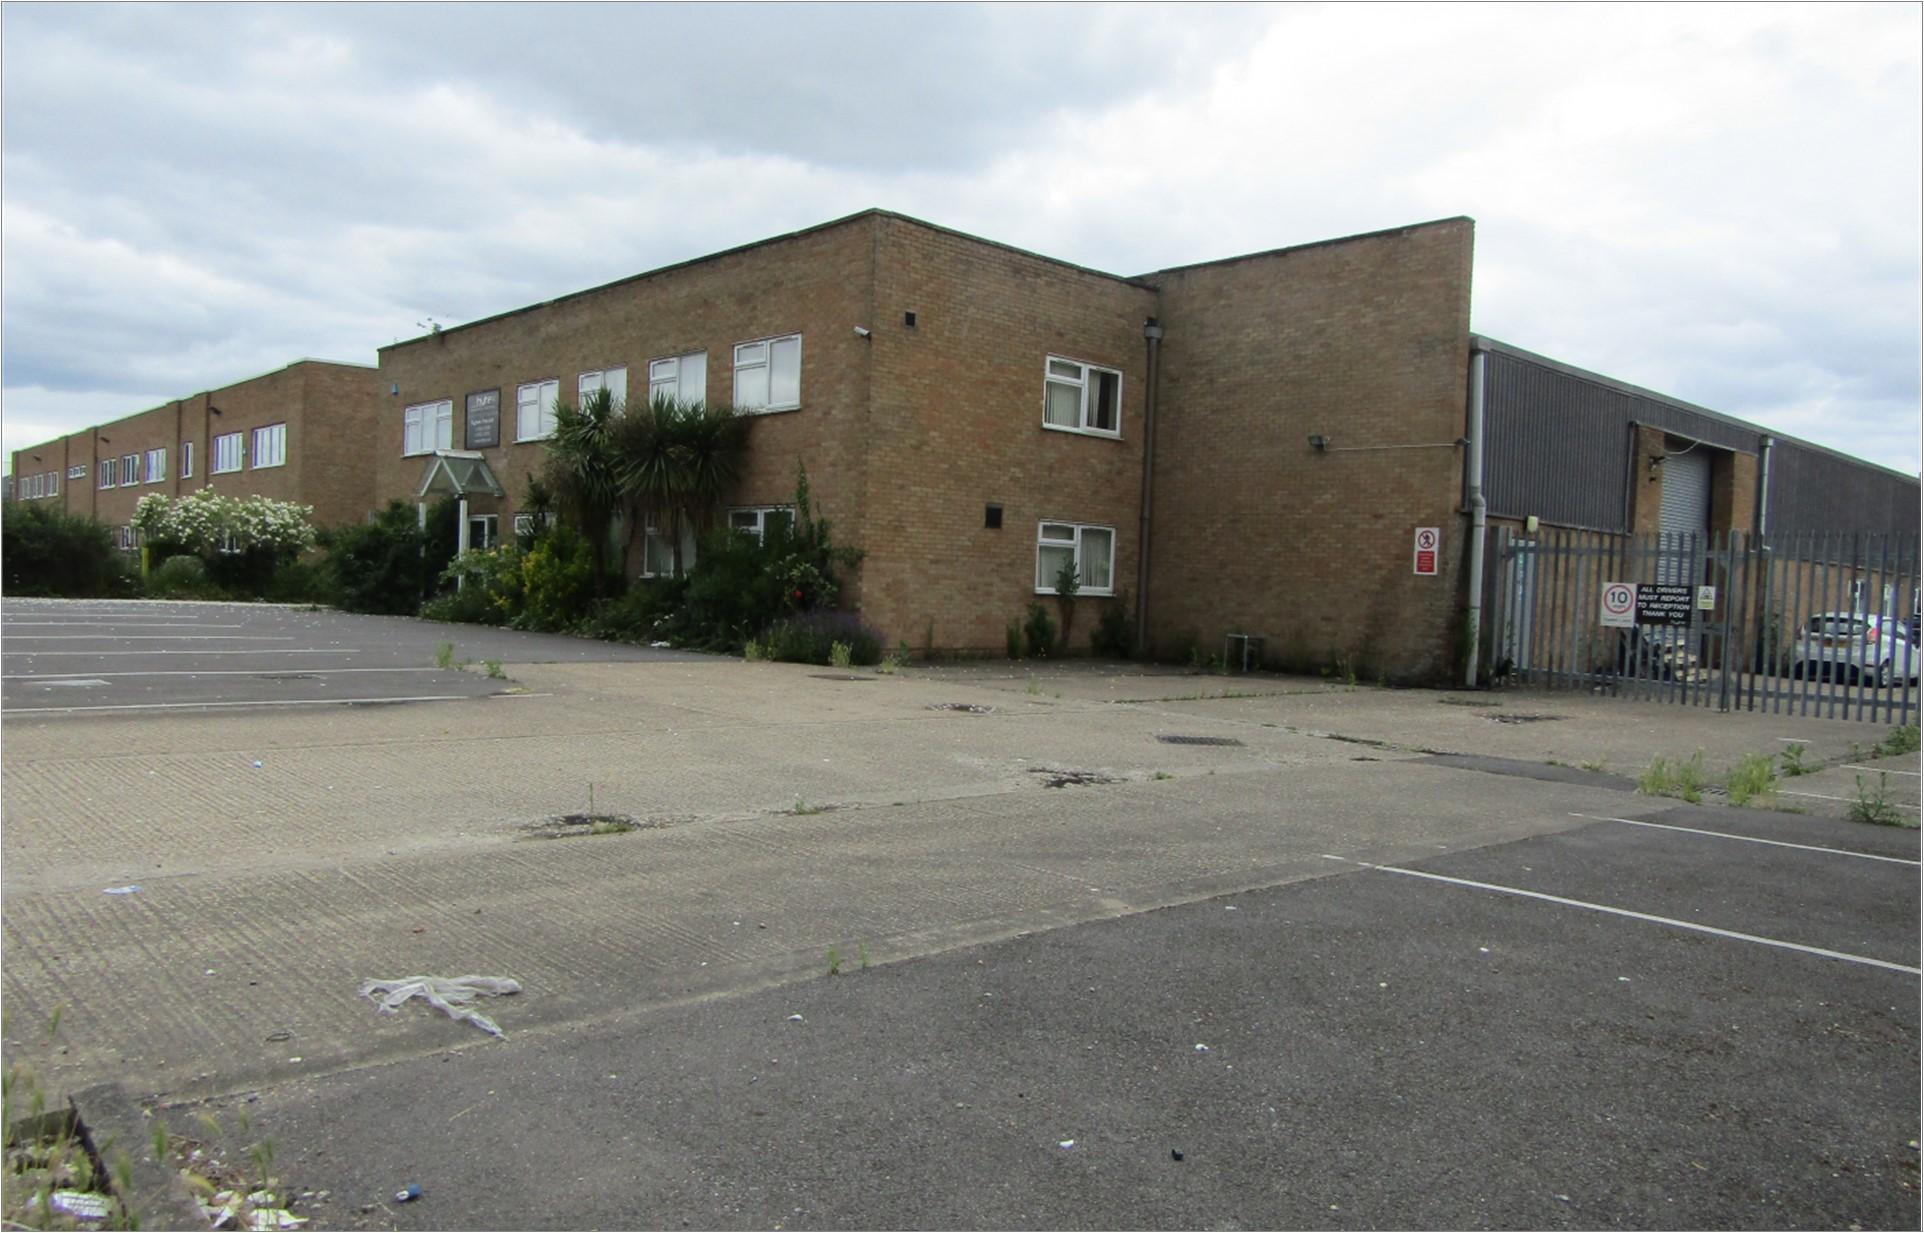 Hytex House, Geddings Road, Hoddesdon